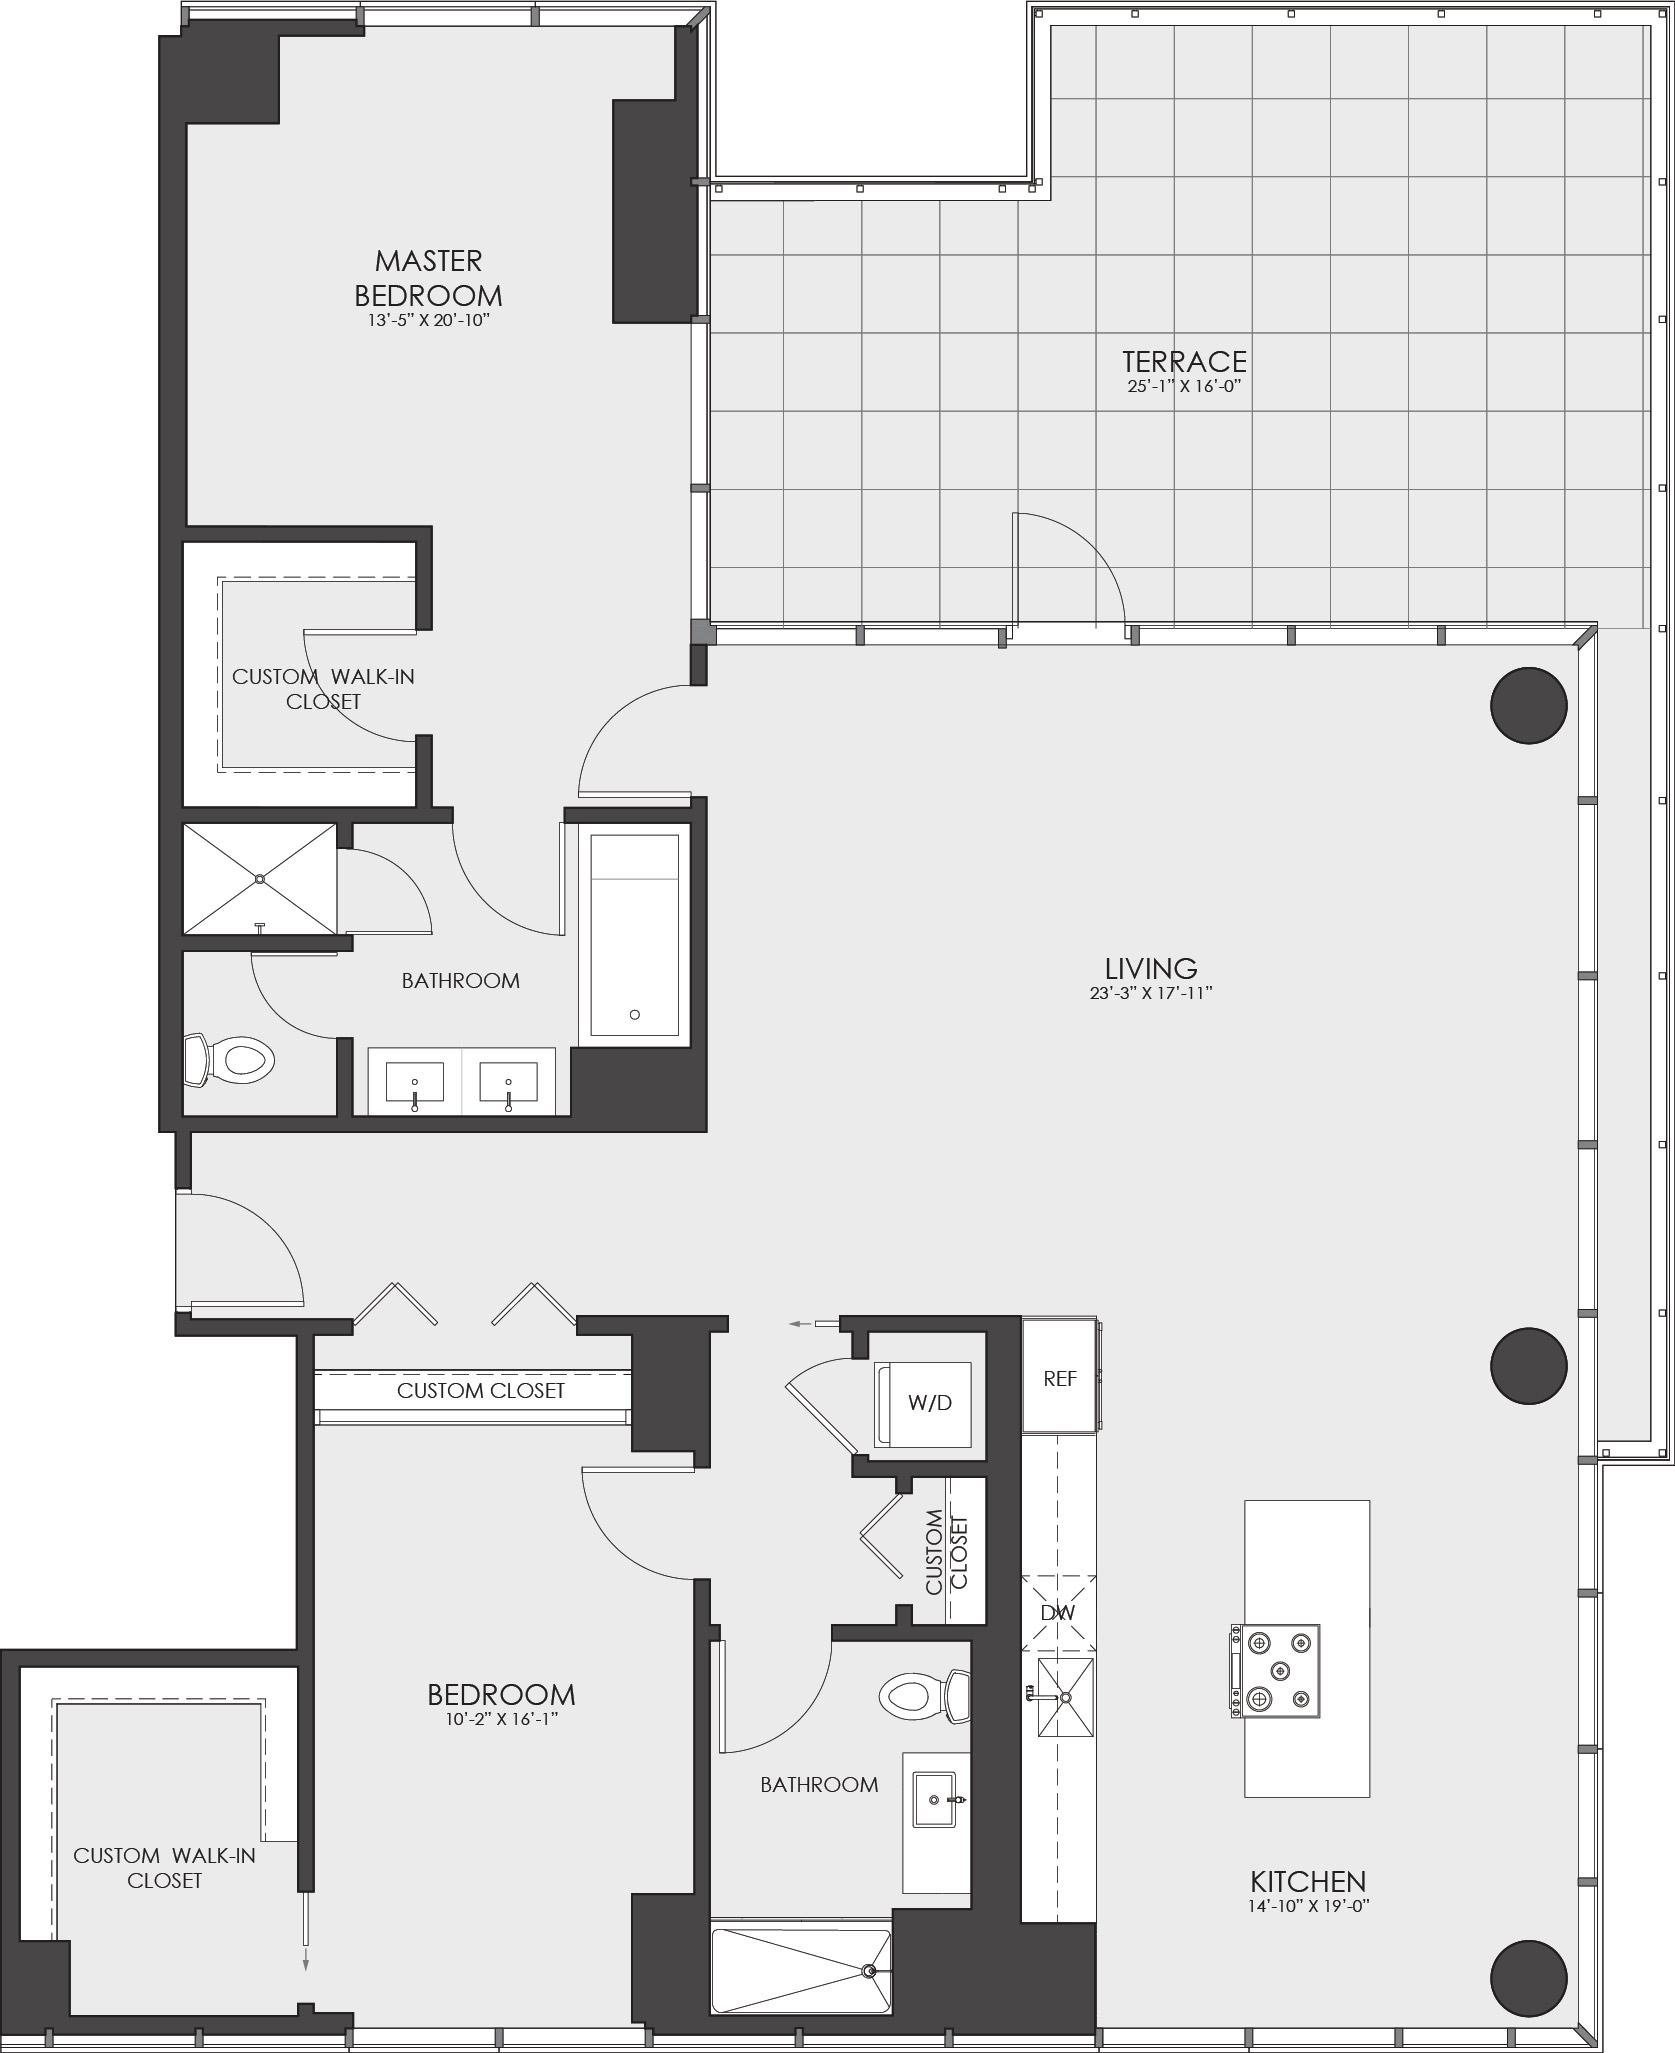 P0614109 796bcp02 221hubbard ph2b3 1694 2 floorplan